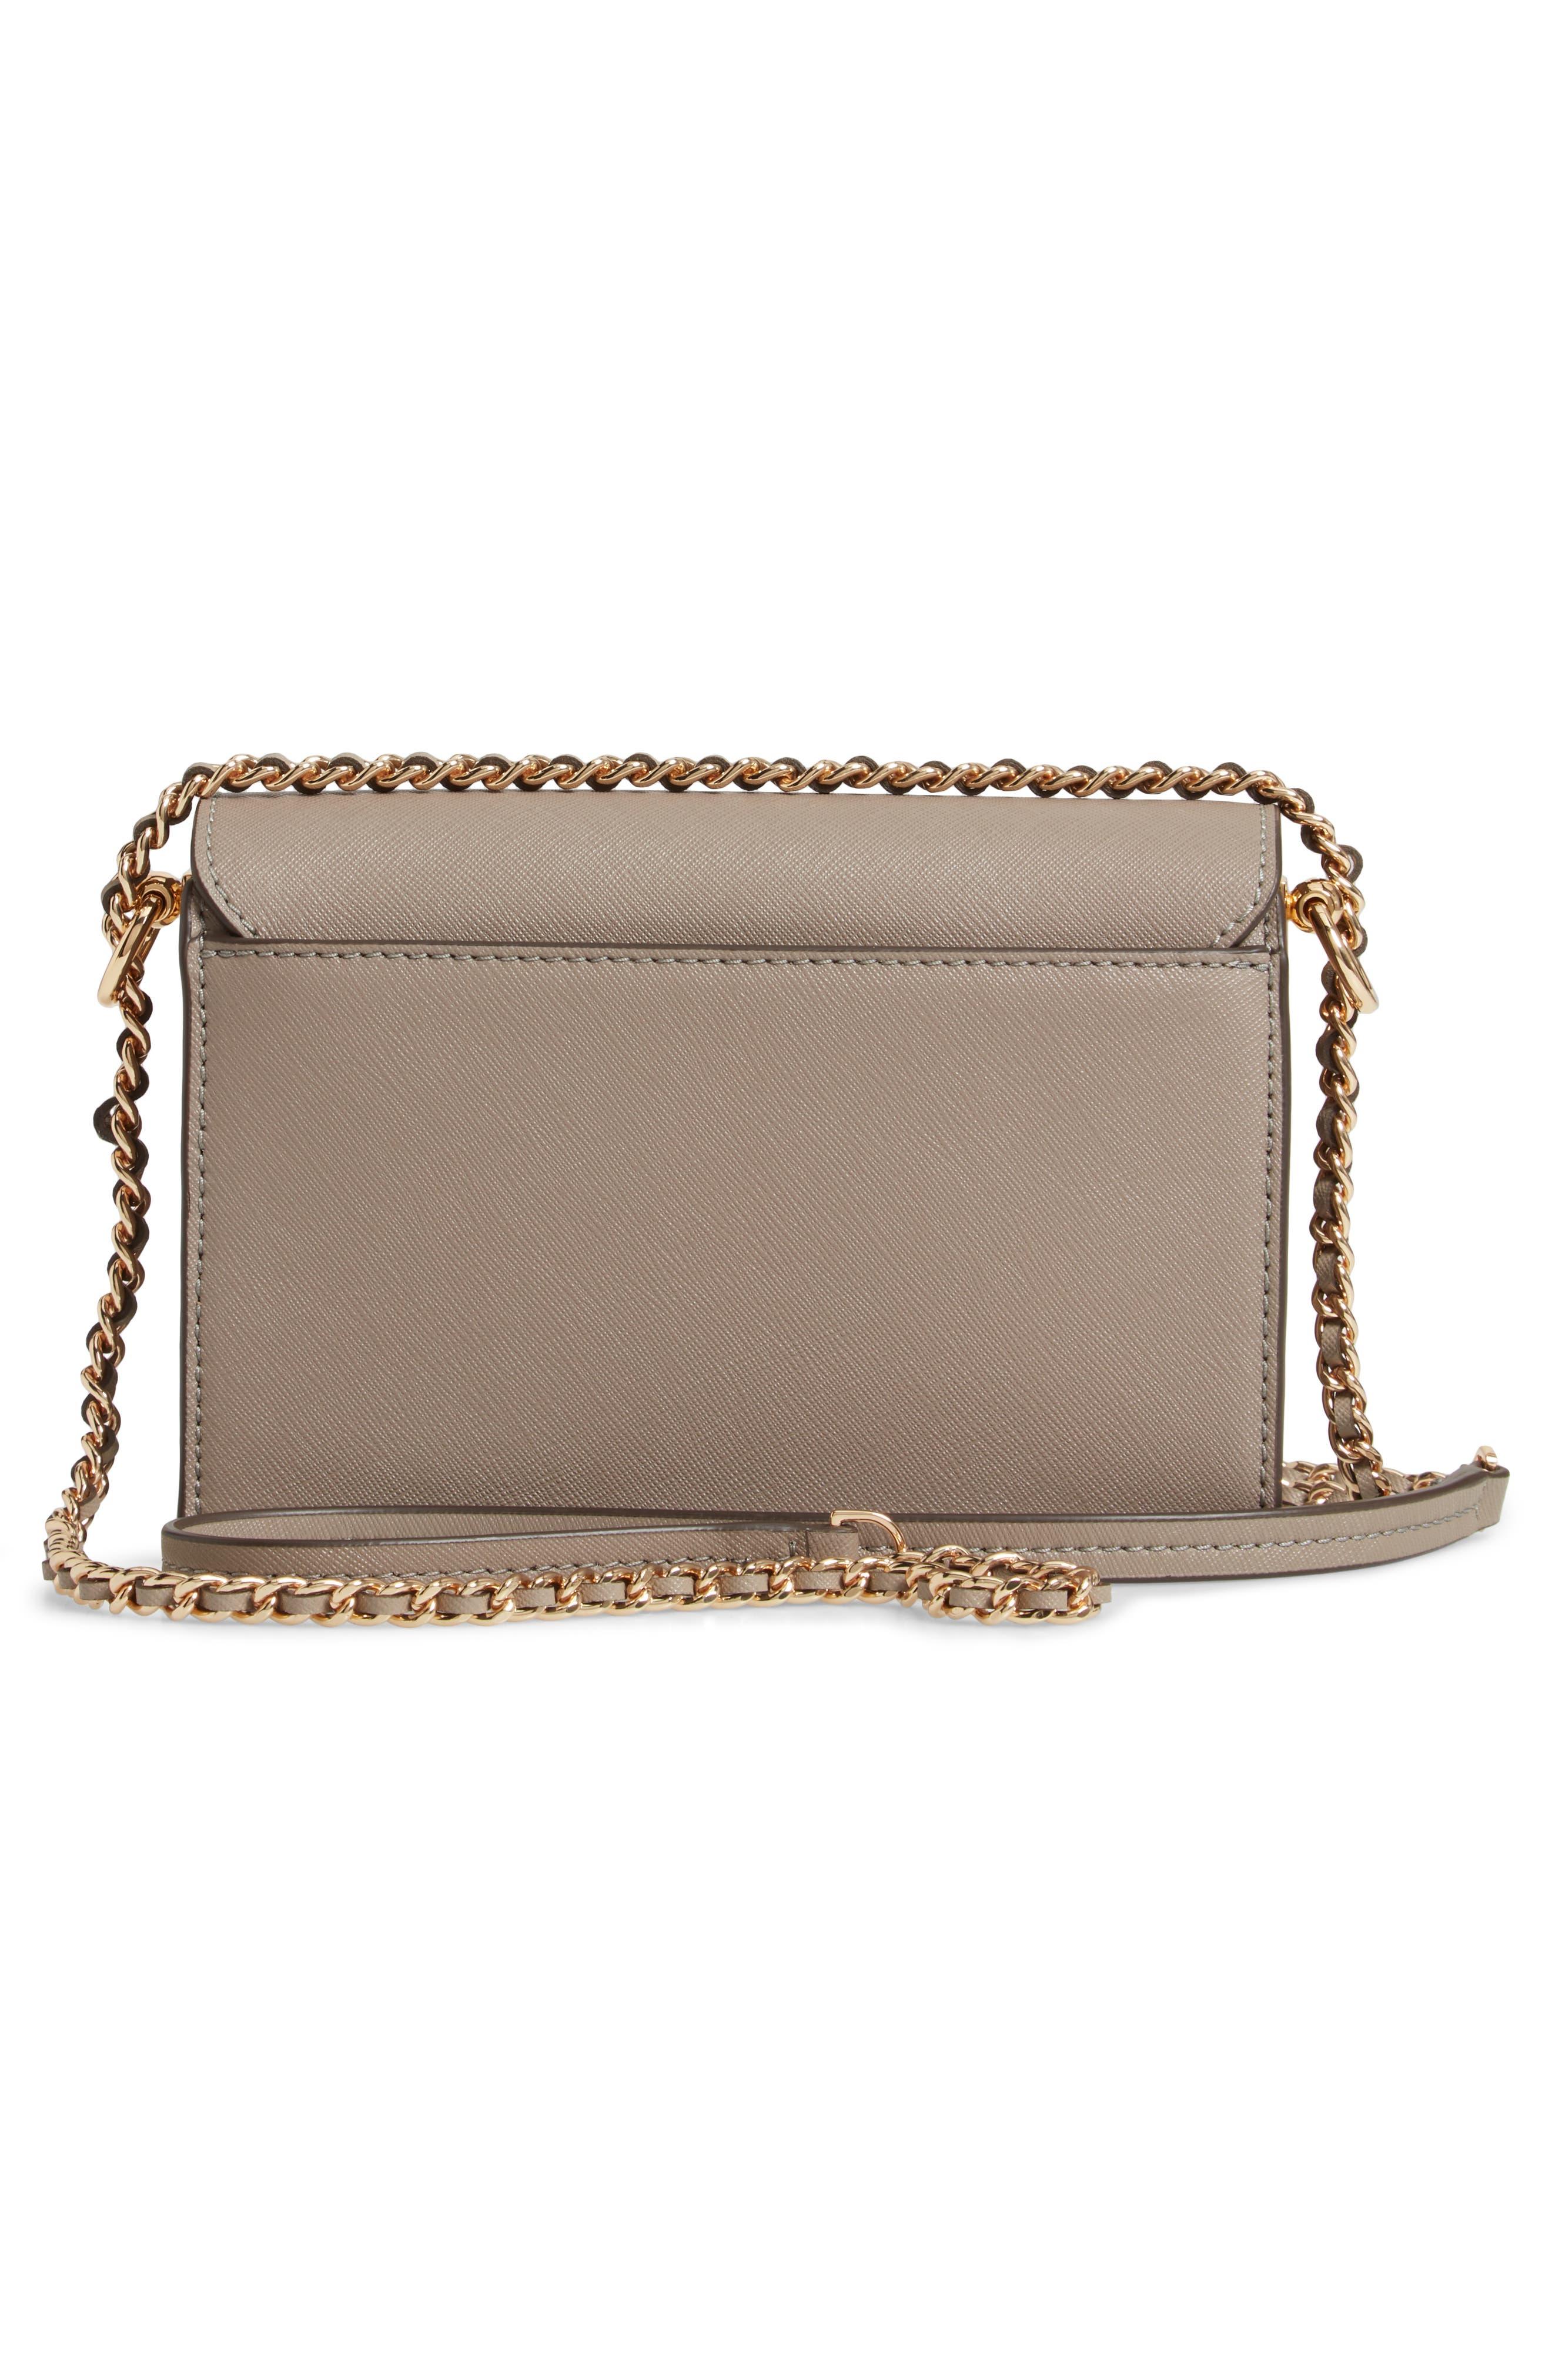 Mini Robinson Convertible Leather Shoulder Bag,                             Alternate thumbnail 3, color,                             GRAY HERON